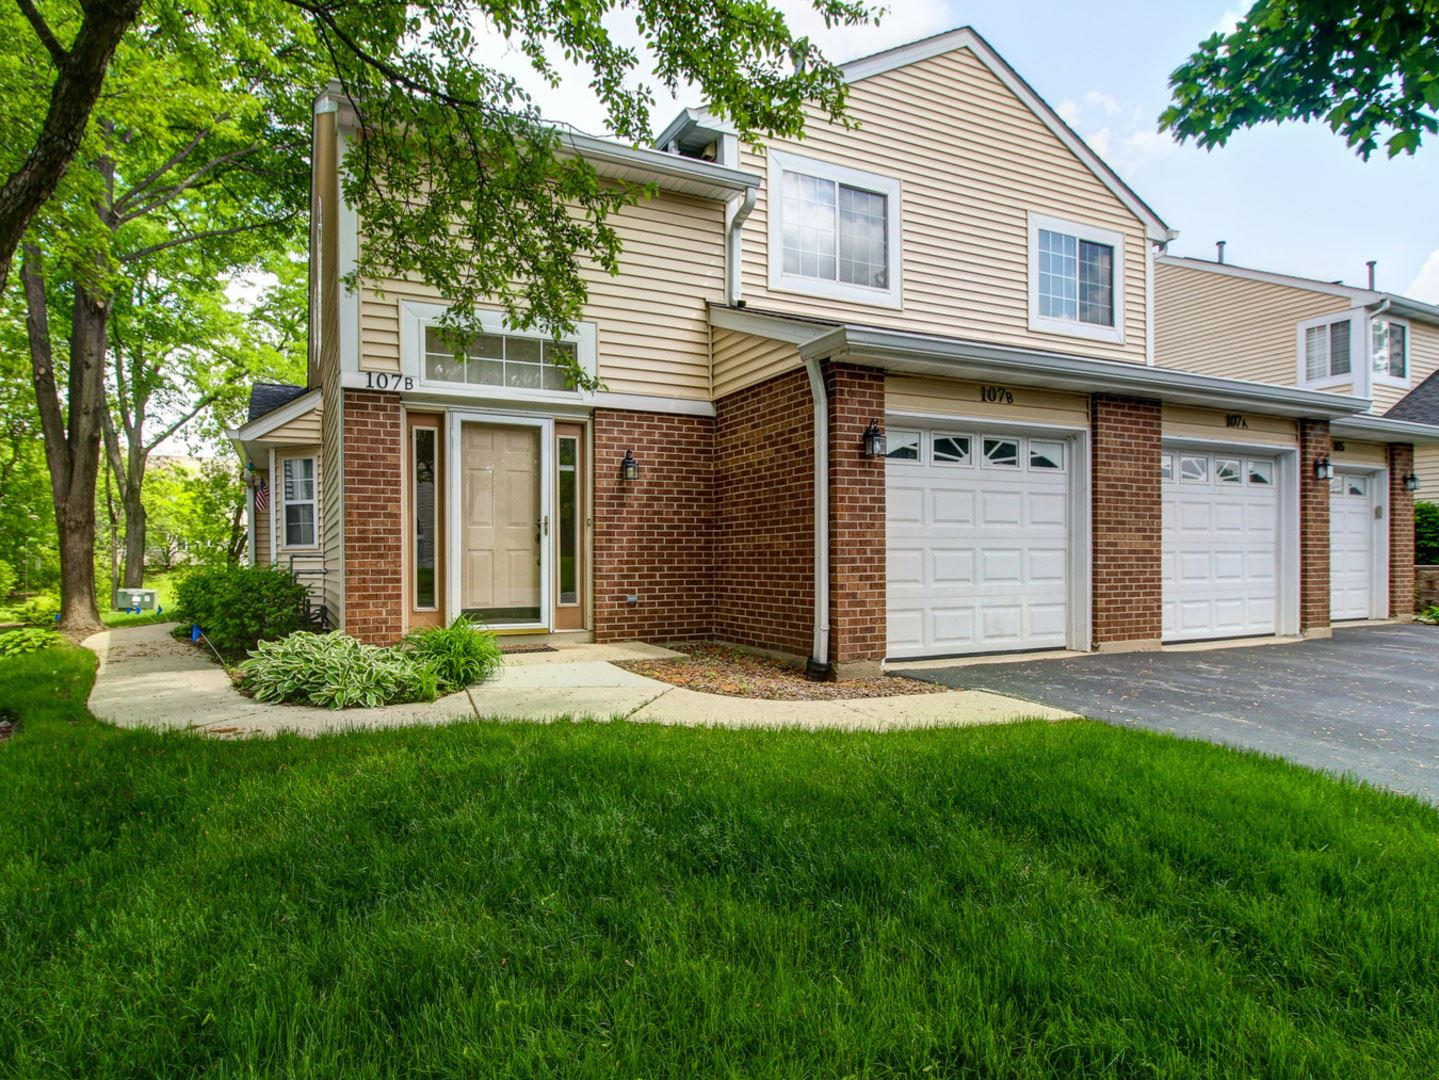 107 Winchester Drive #1B-2, Streamwood, IL 60107 - #: 10729687